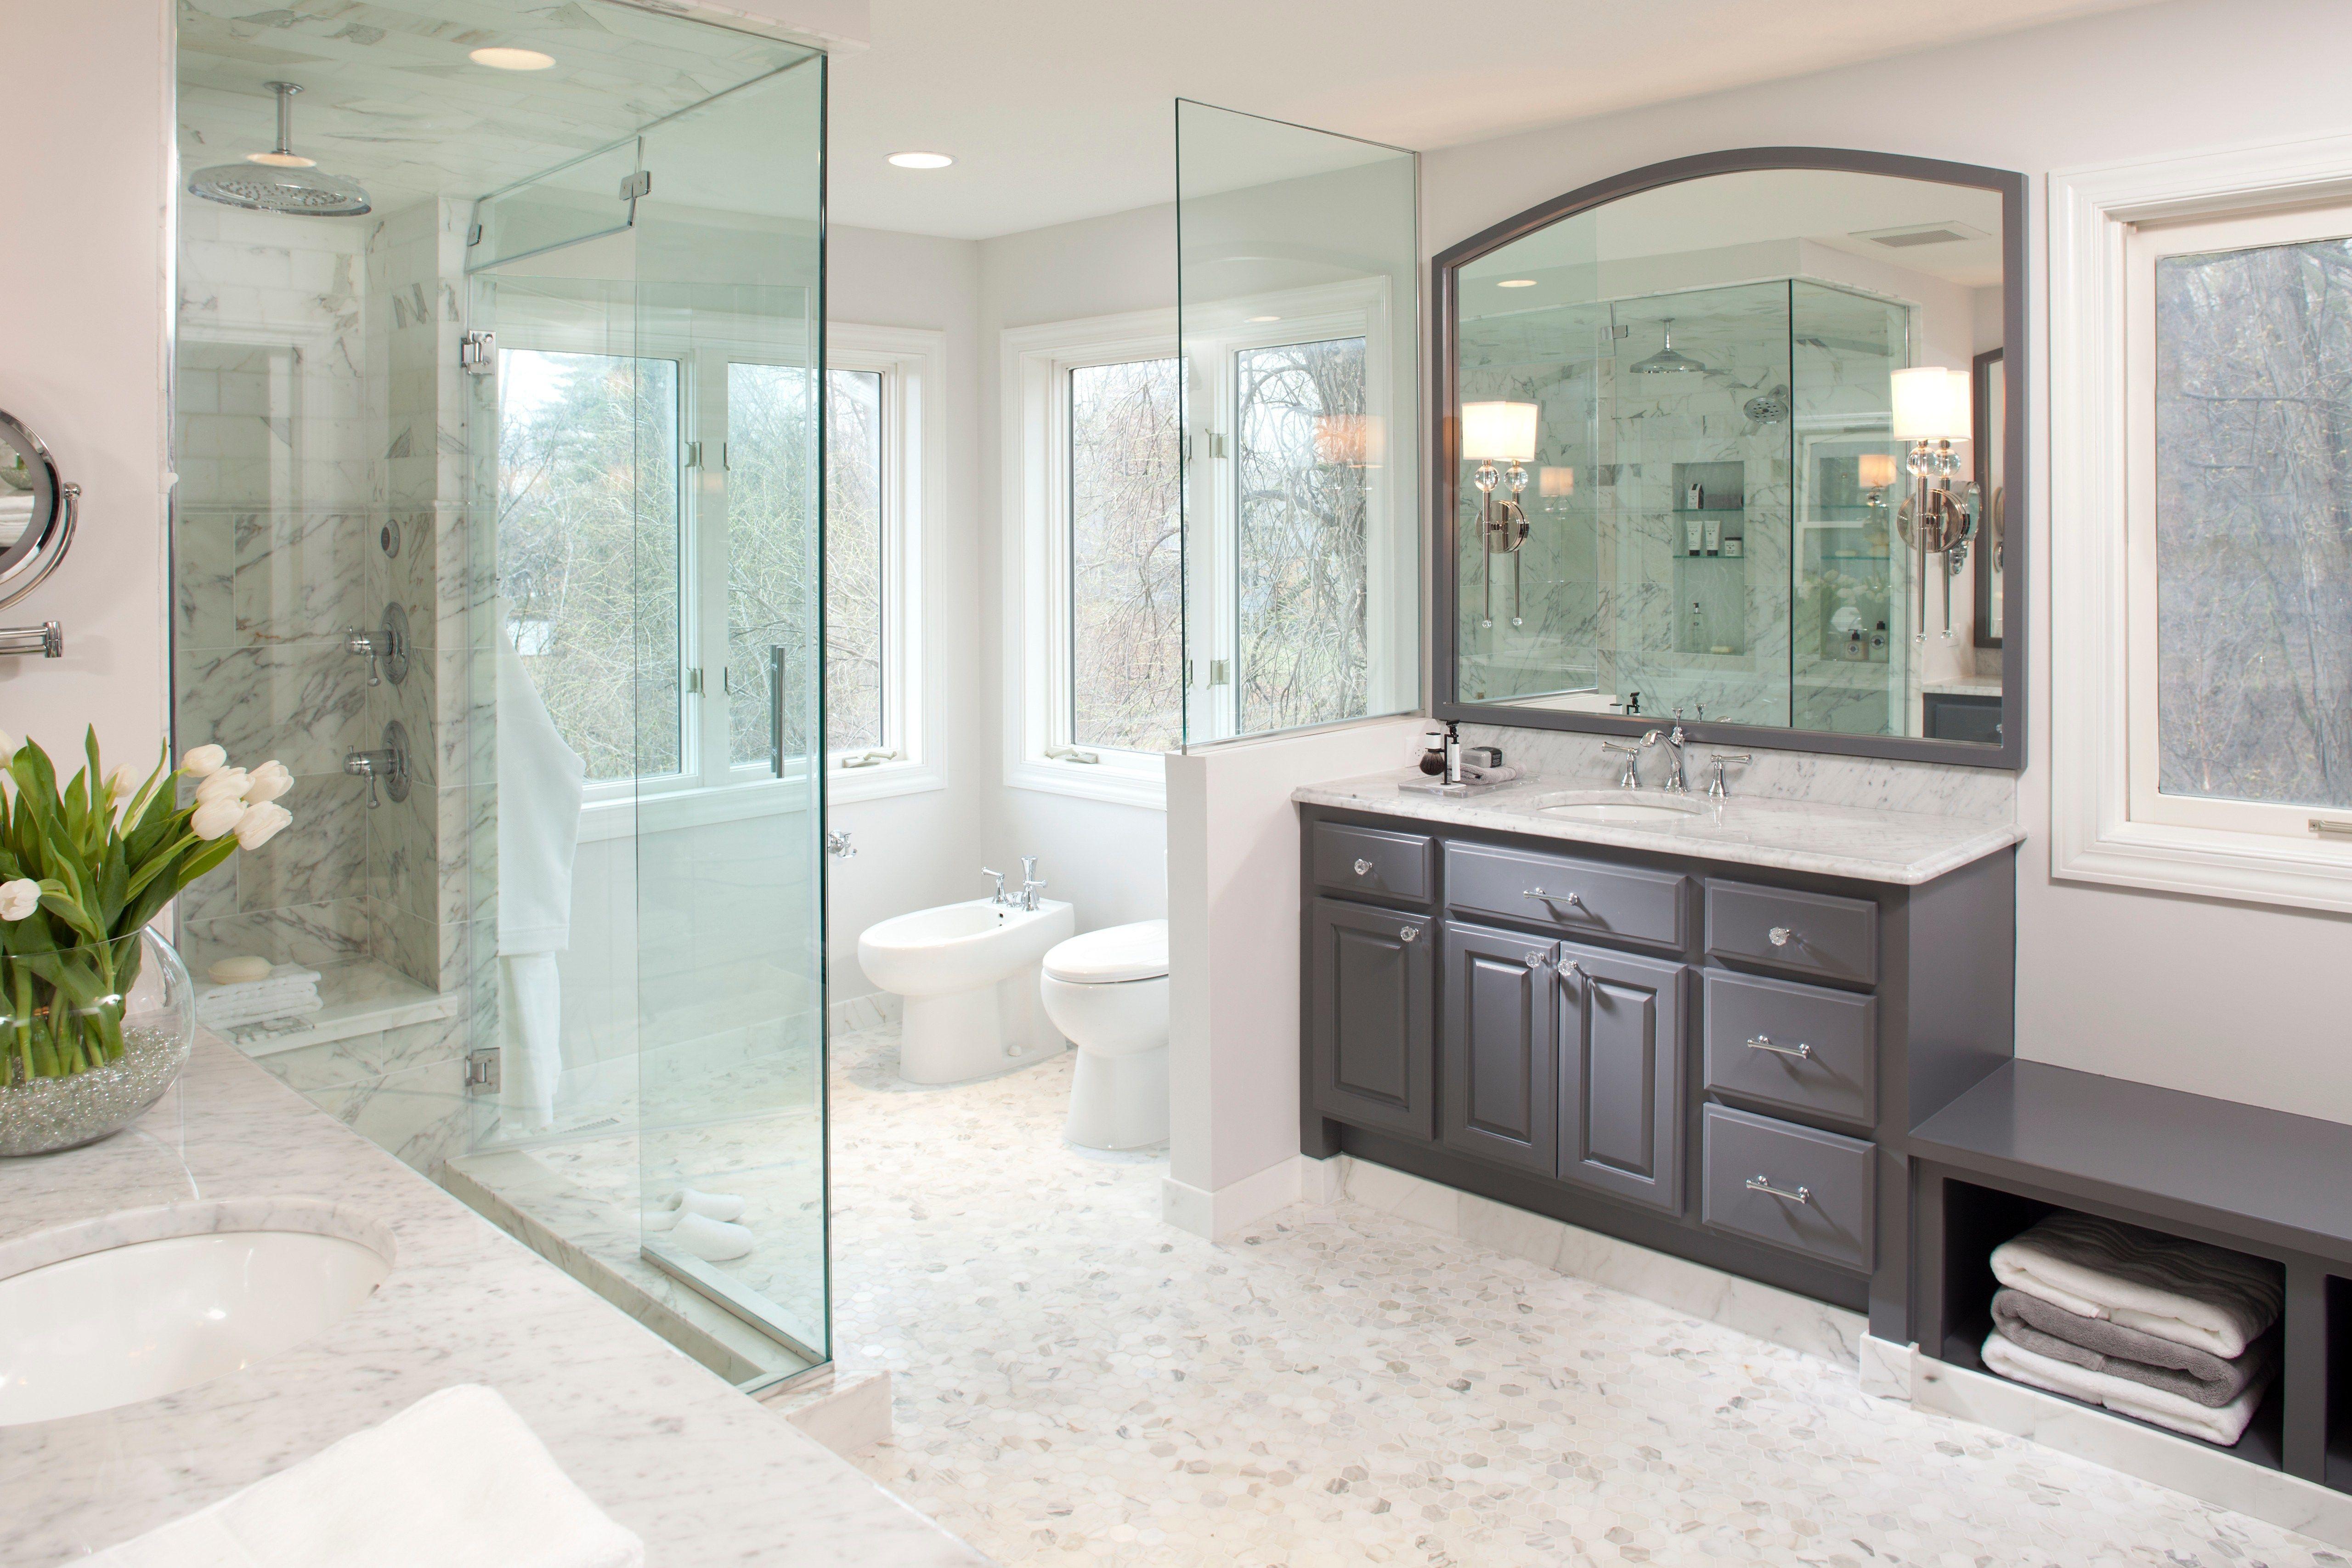 Great Master Bathroom Ideas Houzz With Small Master Bathroom Houzz Small Houzz Master Bathrooms De Bathroom Remodel Cost Modern Master Bathroom Bathroom Design